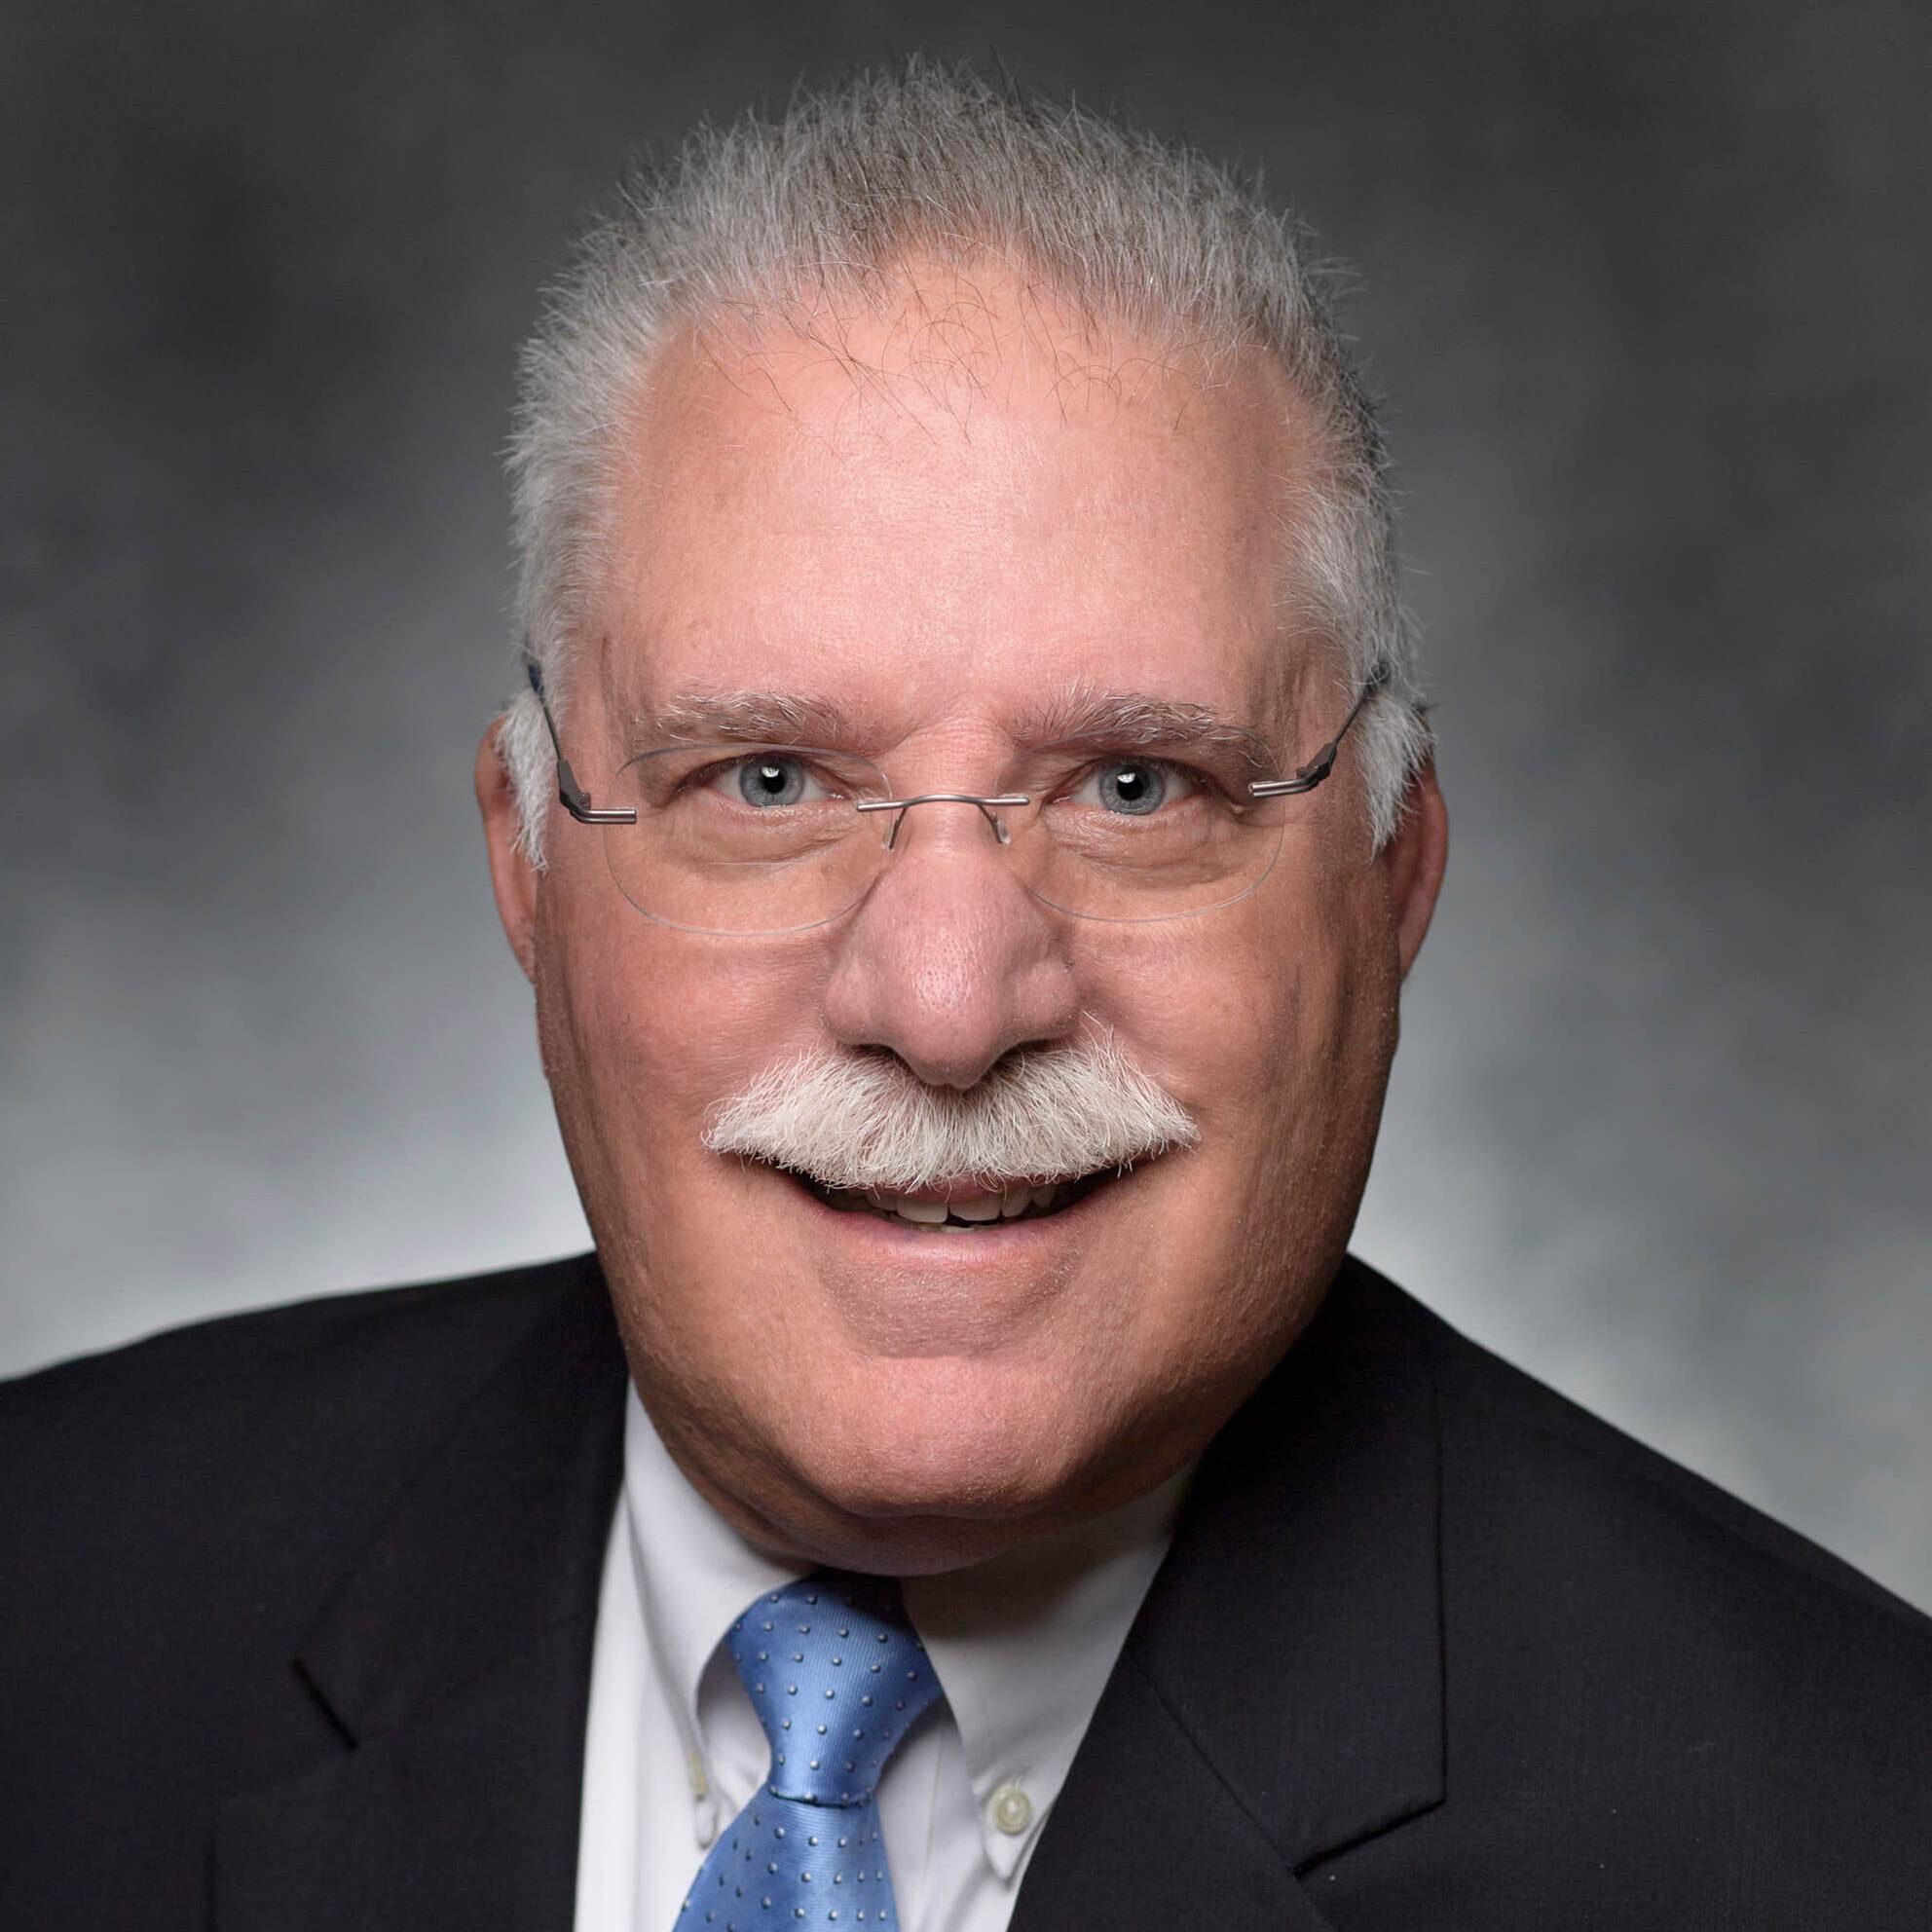 Dennis Savaiano